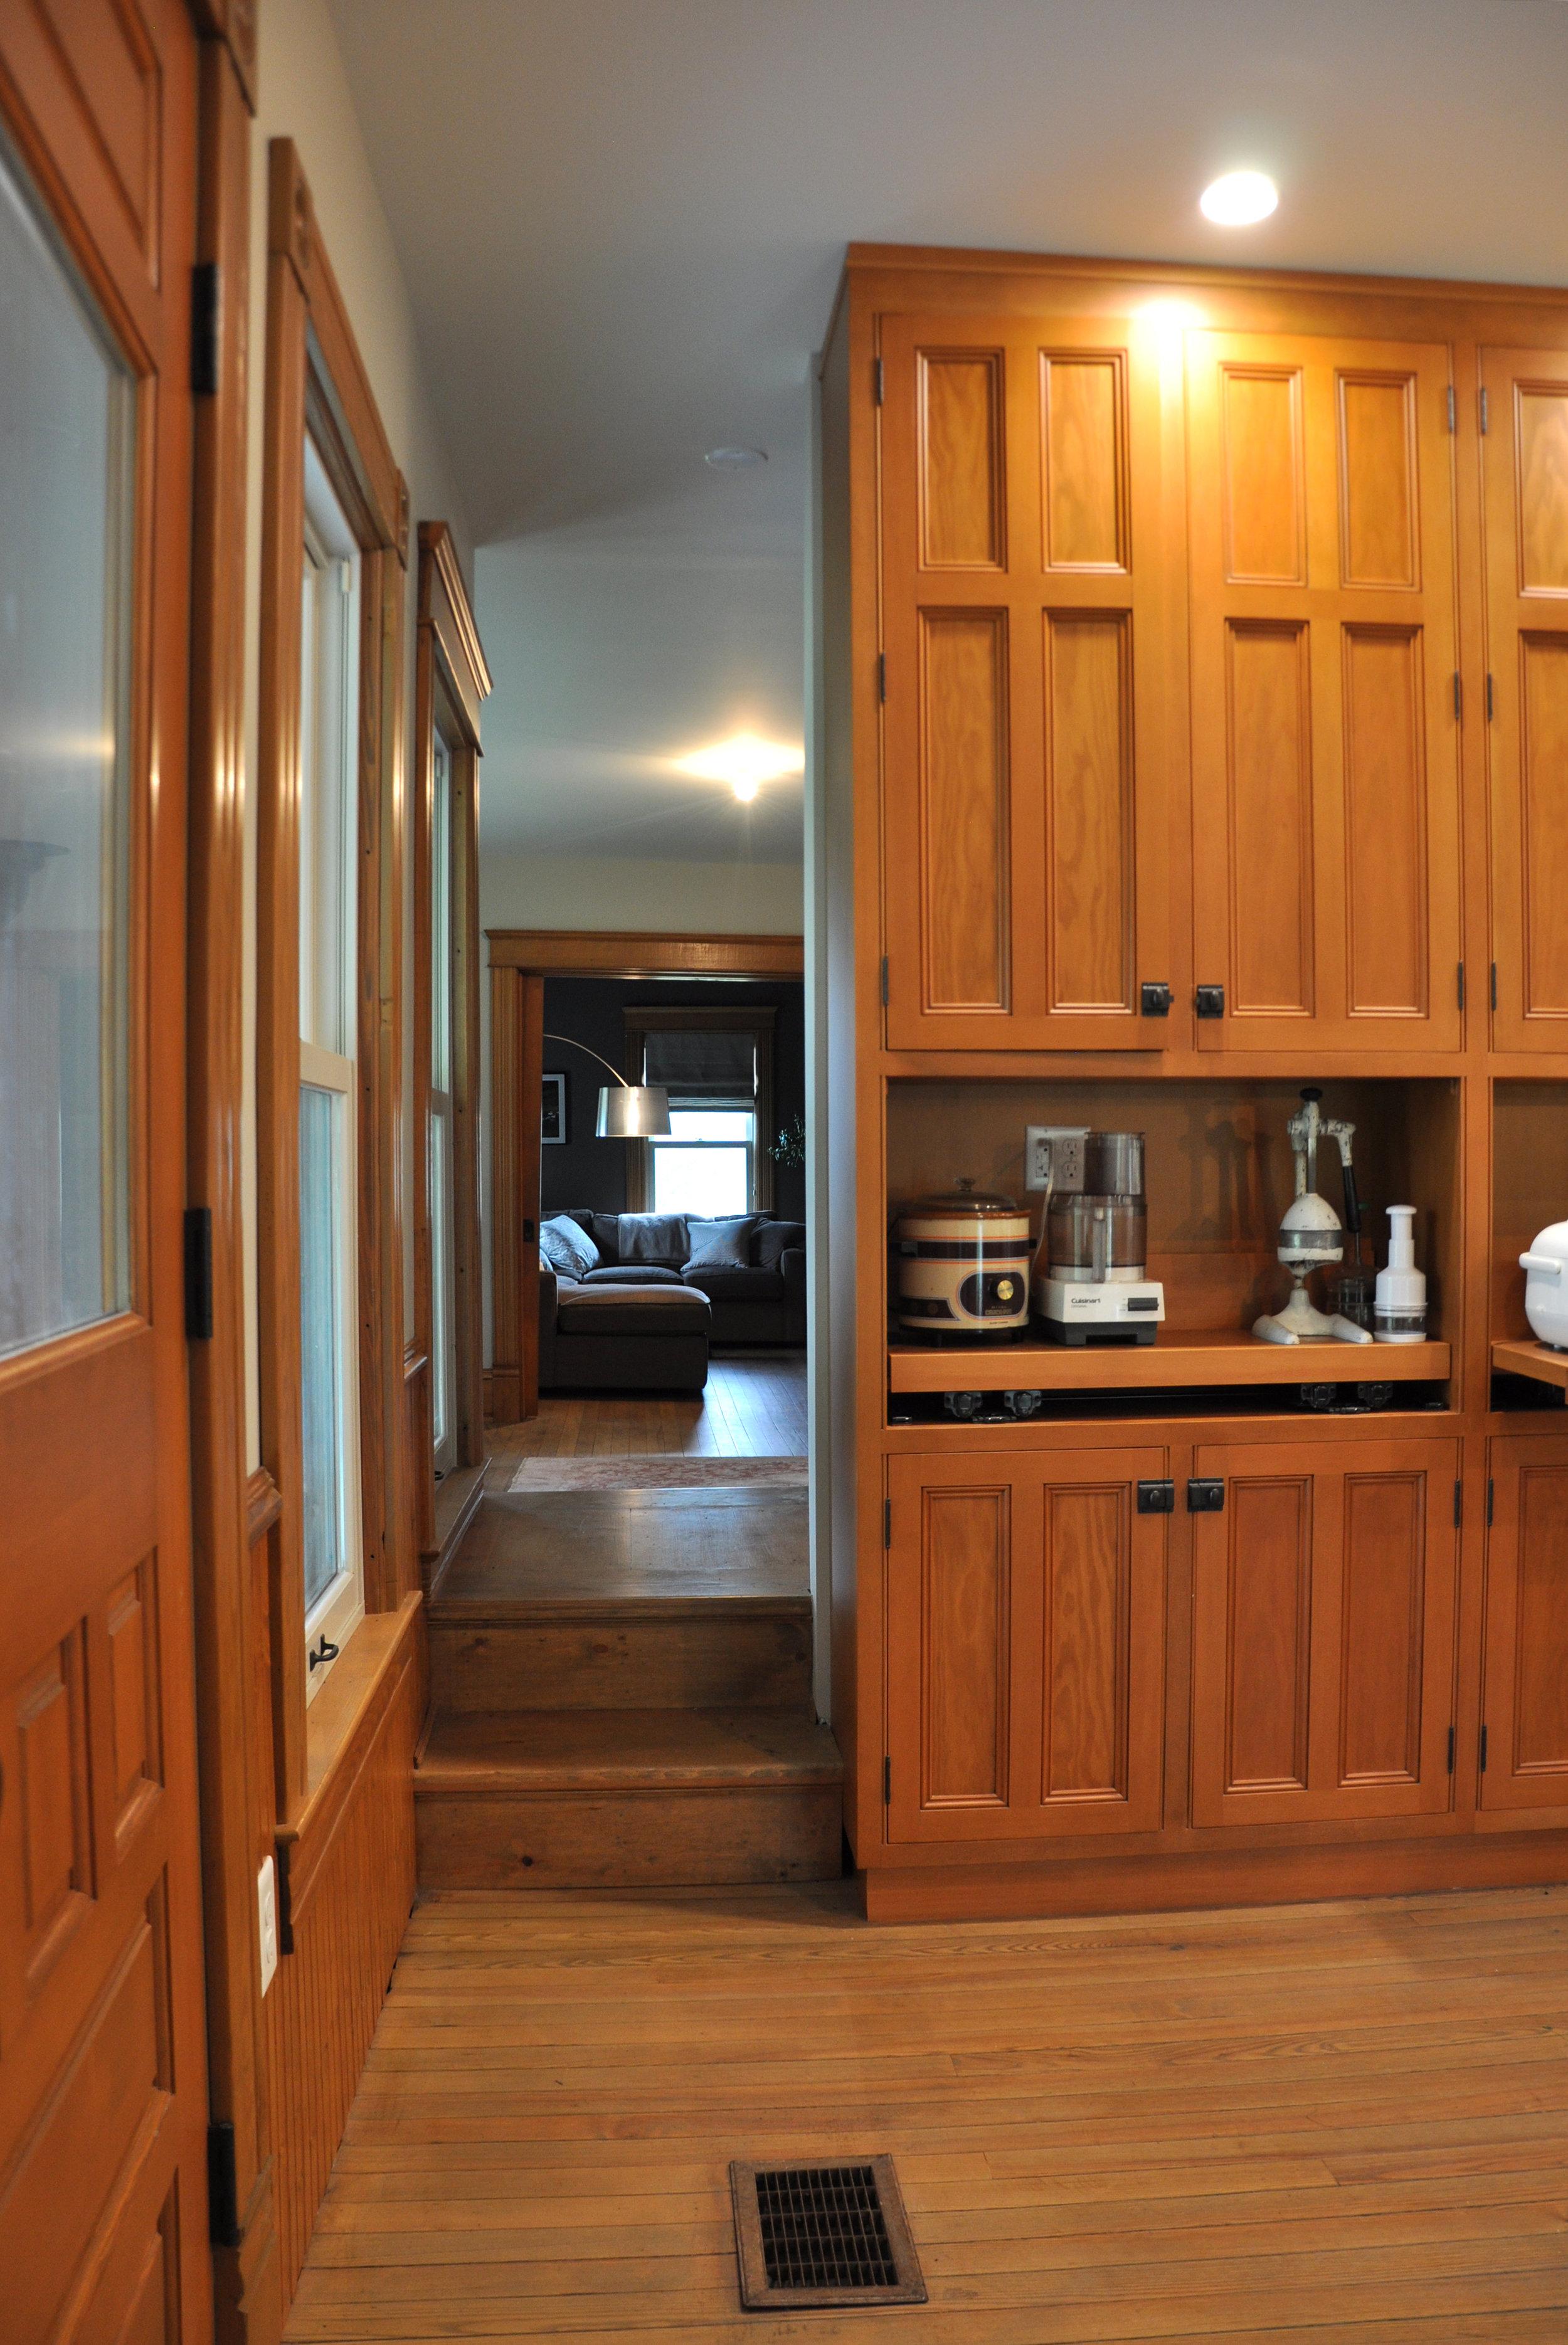 modernized rural farmhouse, residential renovation, open plan, new kitchen, new interior finishes, kitchen storage, interior stairs